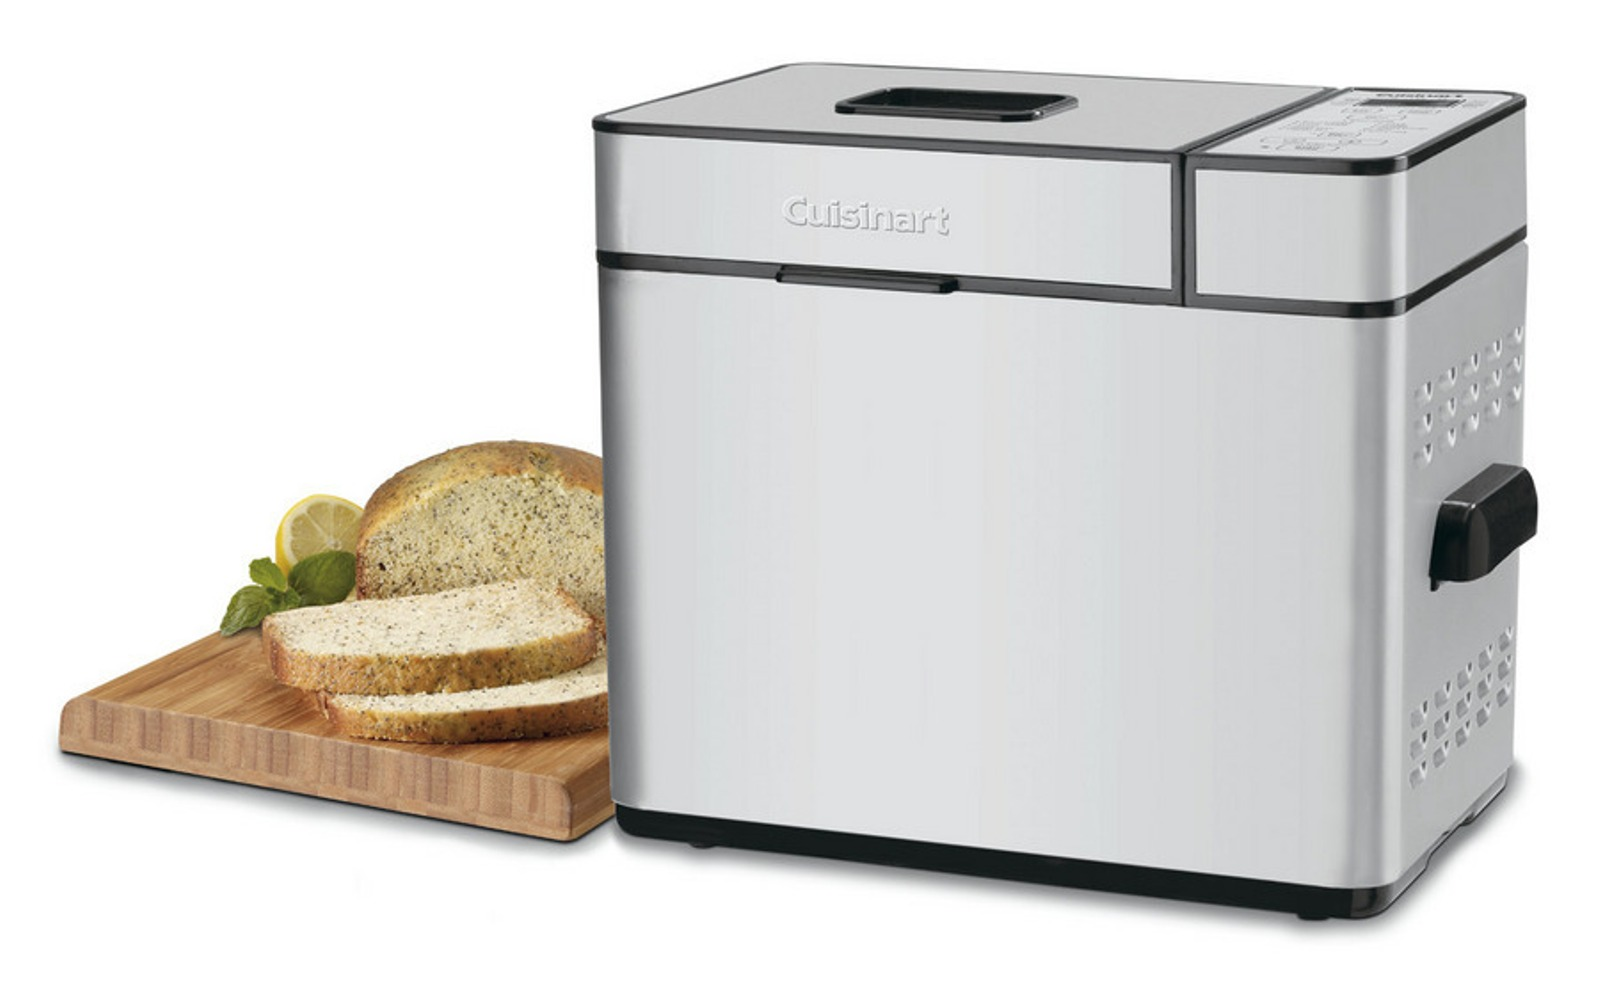 Cuisinart CBK-100 Breadmaker